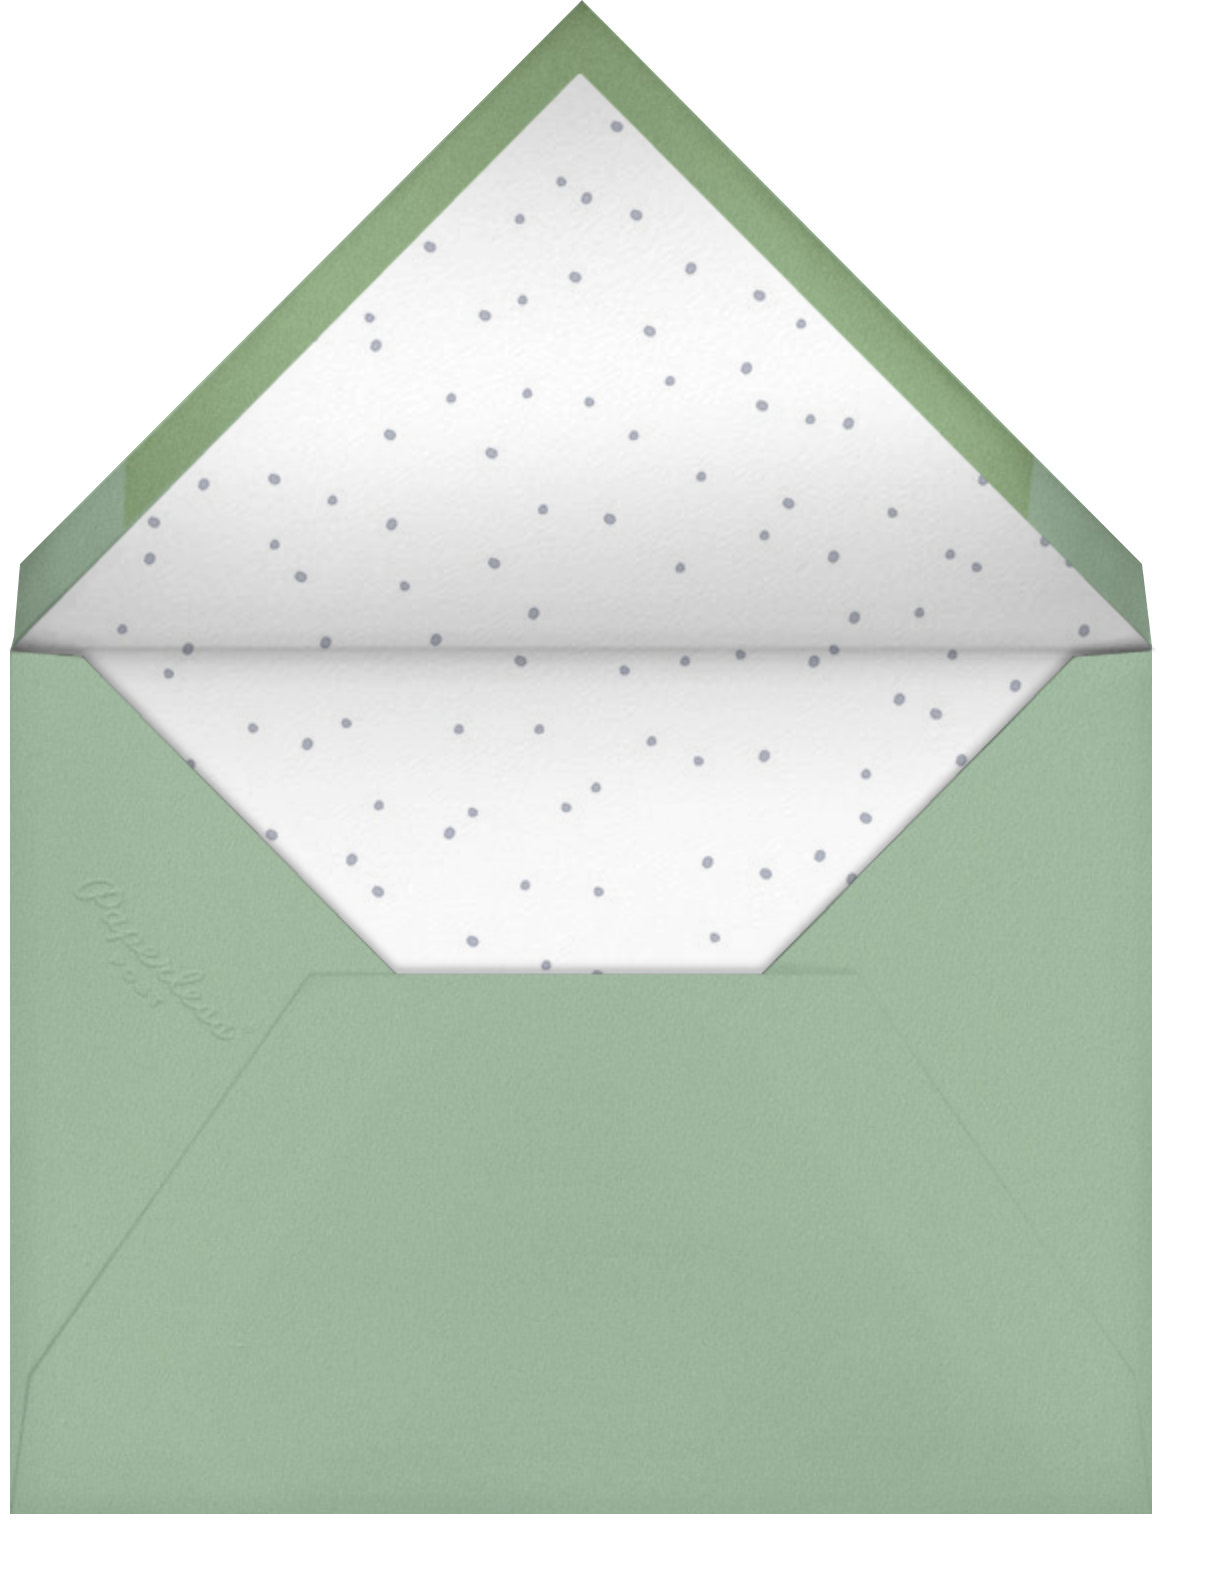 Jungle Love Photo - Little Cube - Birth - envelope back